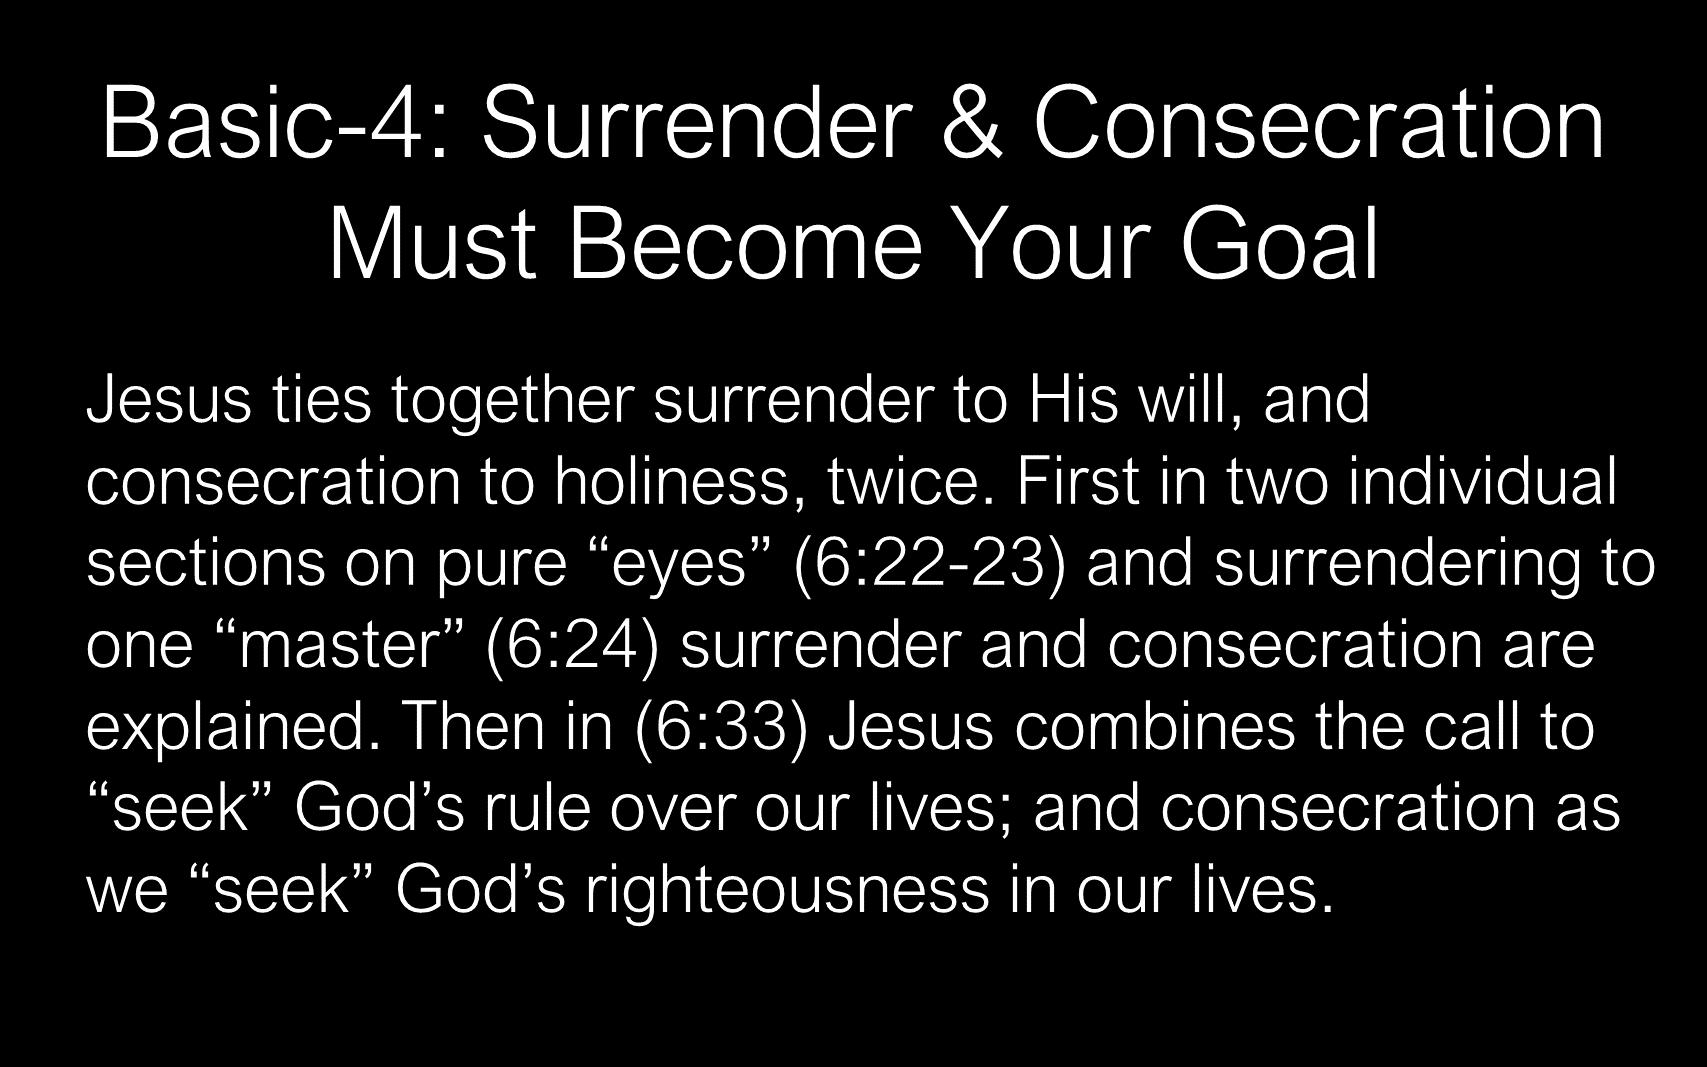 ESH-11 - The Discipline Of Disciple-Making - Disciples - Follow Christ & Make Disciples (18)